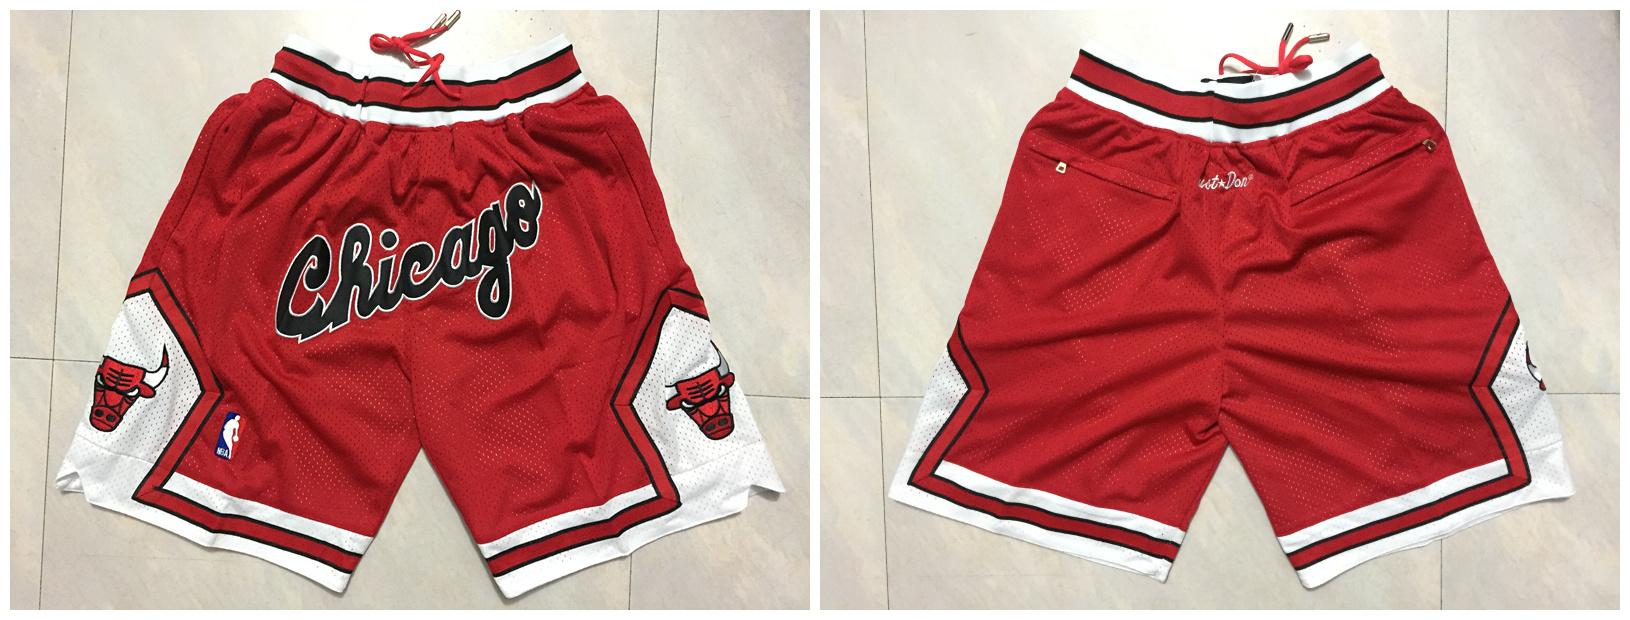 Bulls Red 1997-98 Throwback Shorts